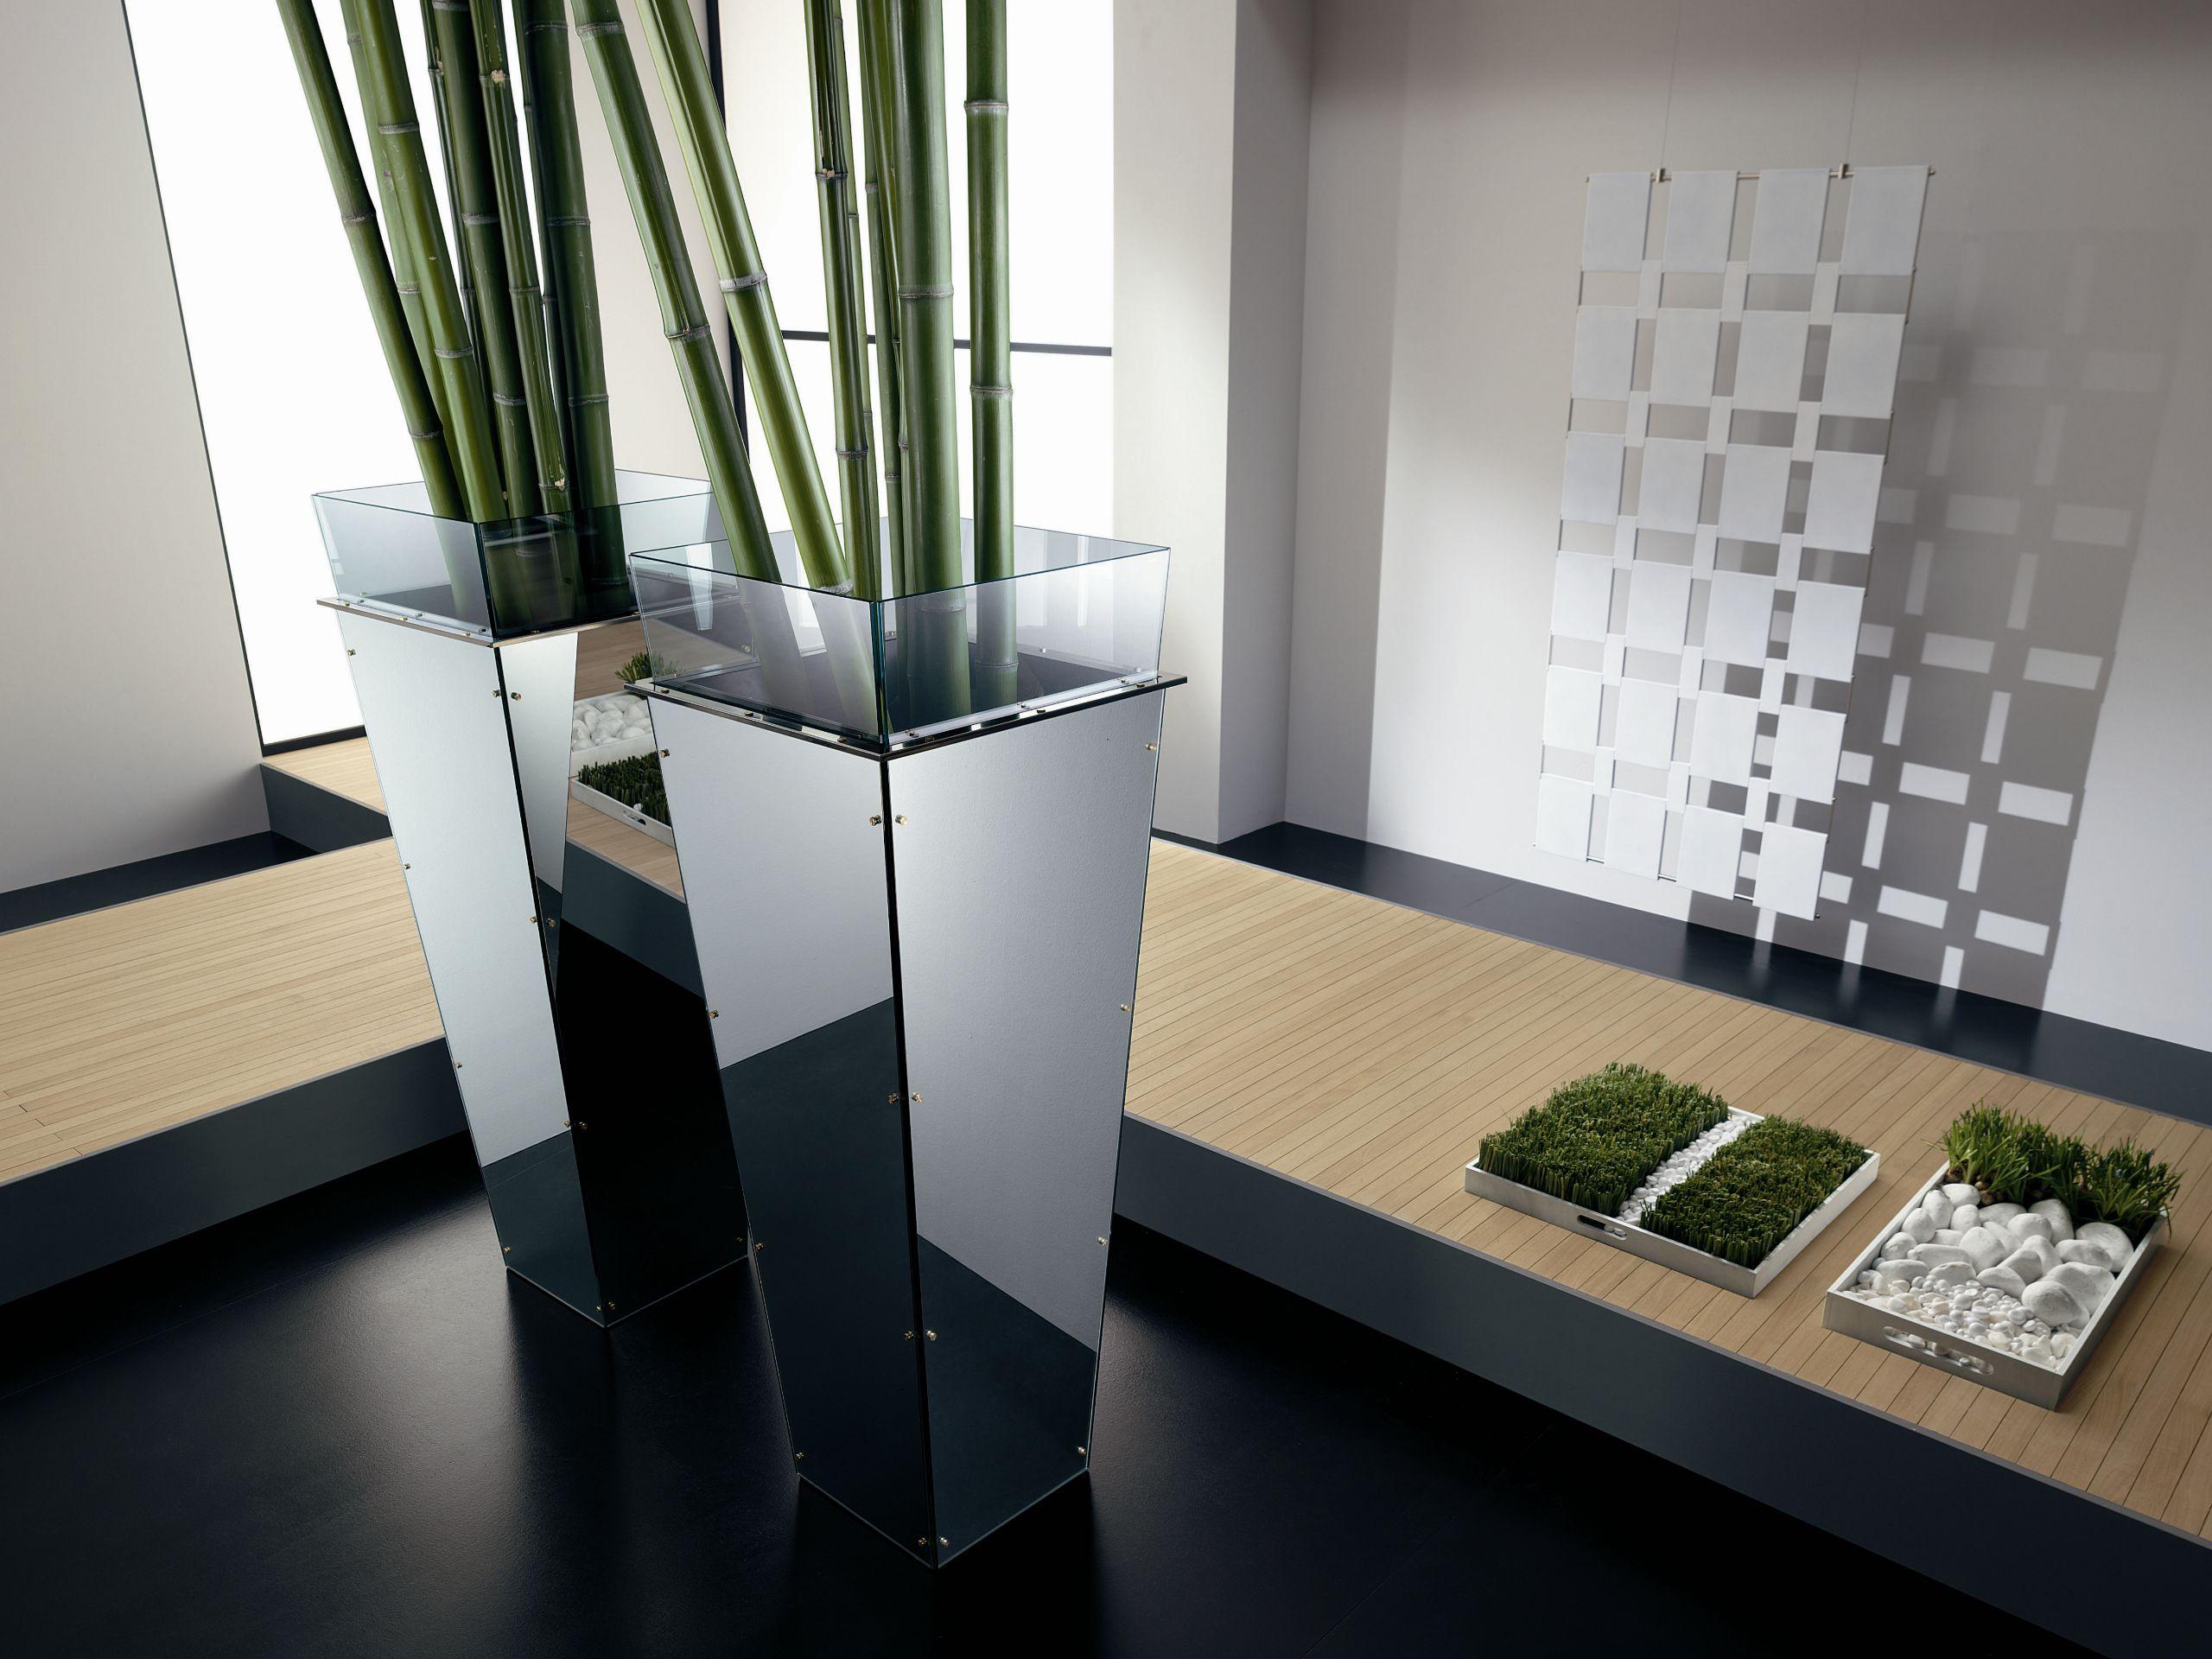 Florero de vidrio amon by t d tonelli design dise o - Floreros modernos ...